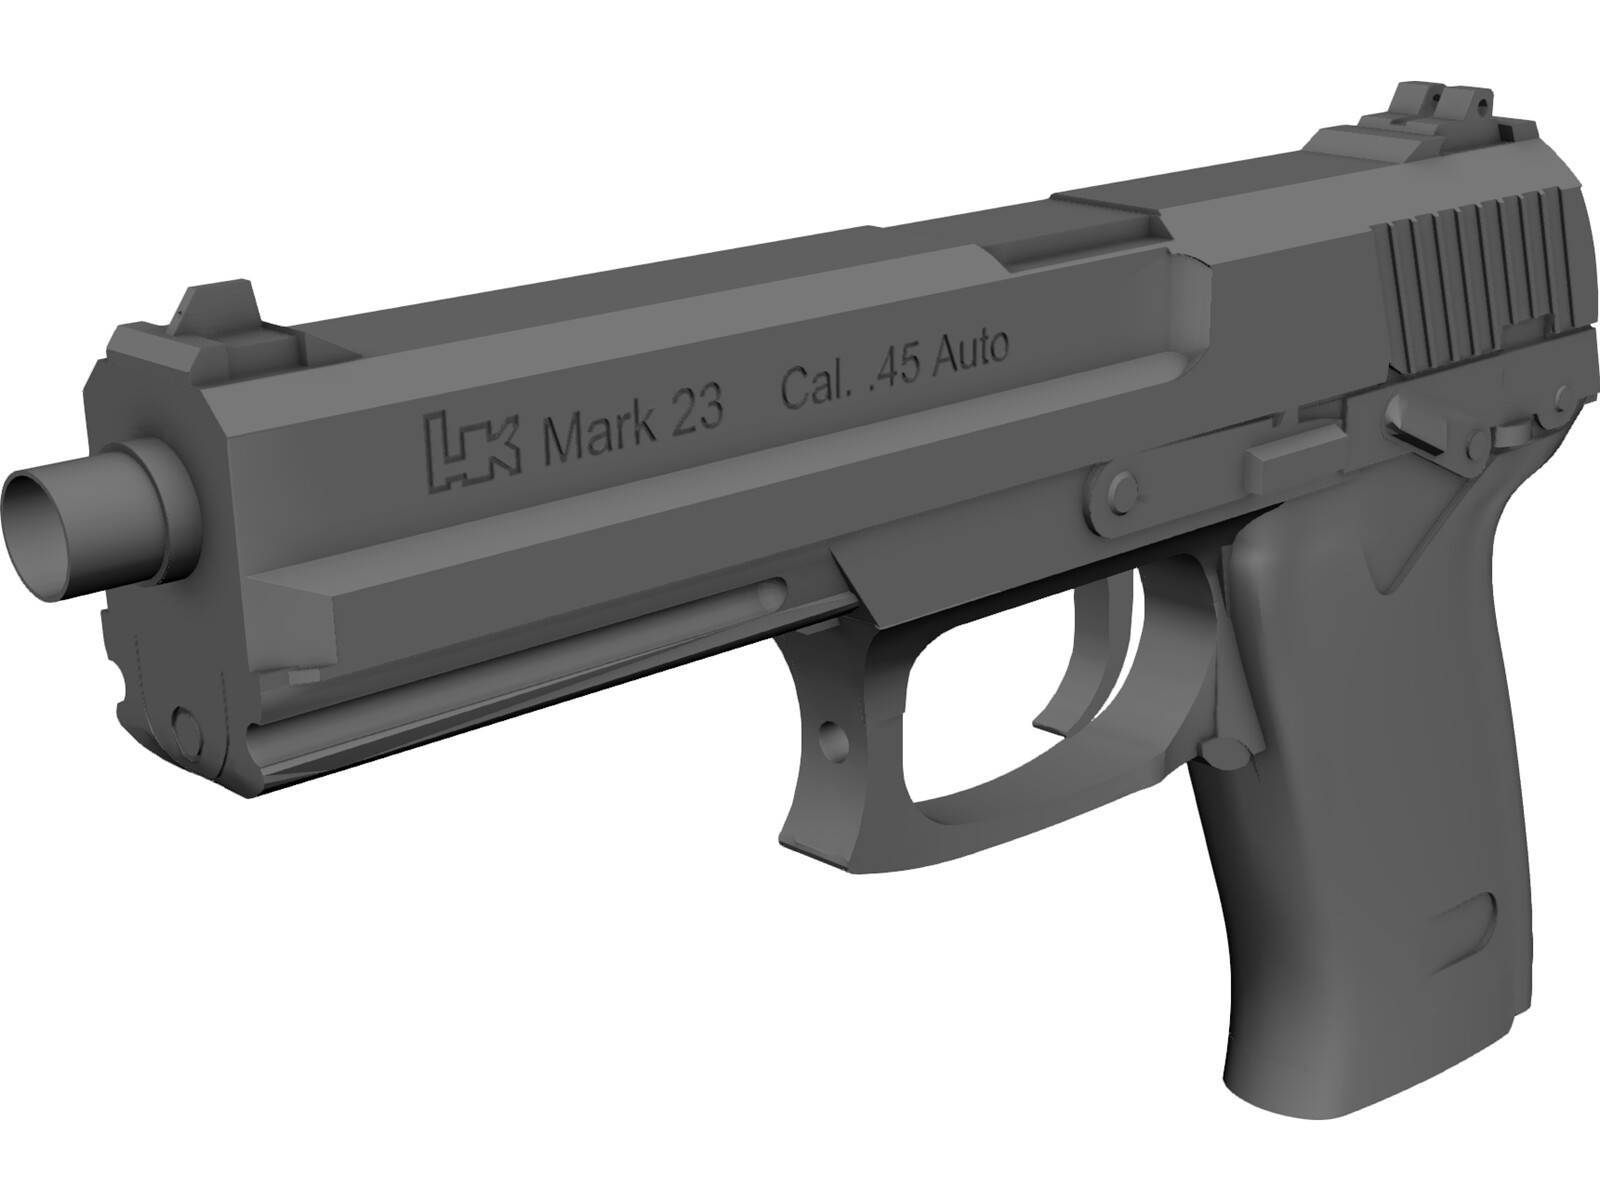 Heckler und koch hk 45 / hk 45c пистолет — характеристики, фото, ттх